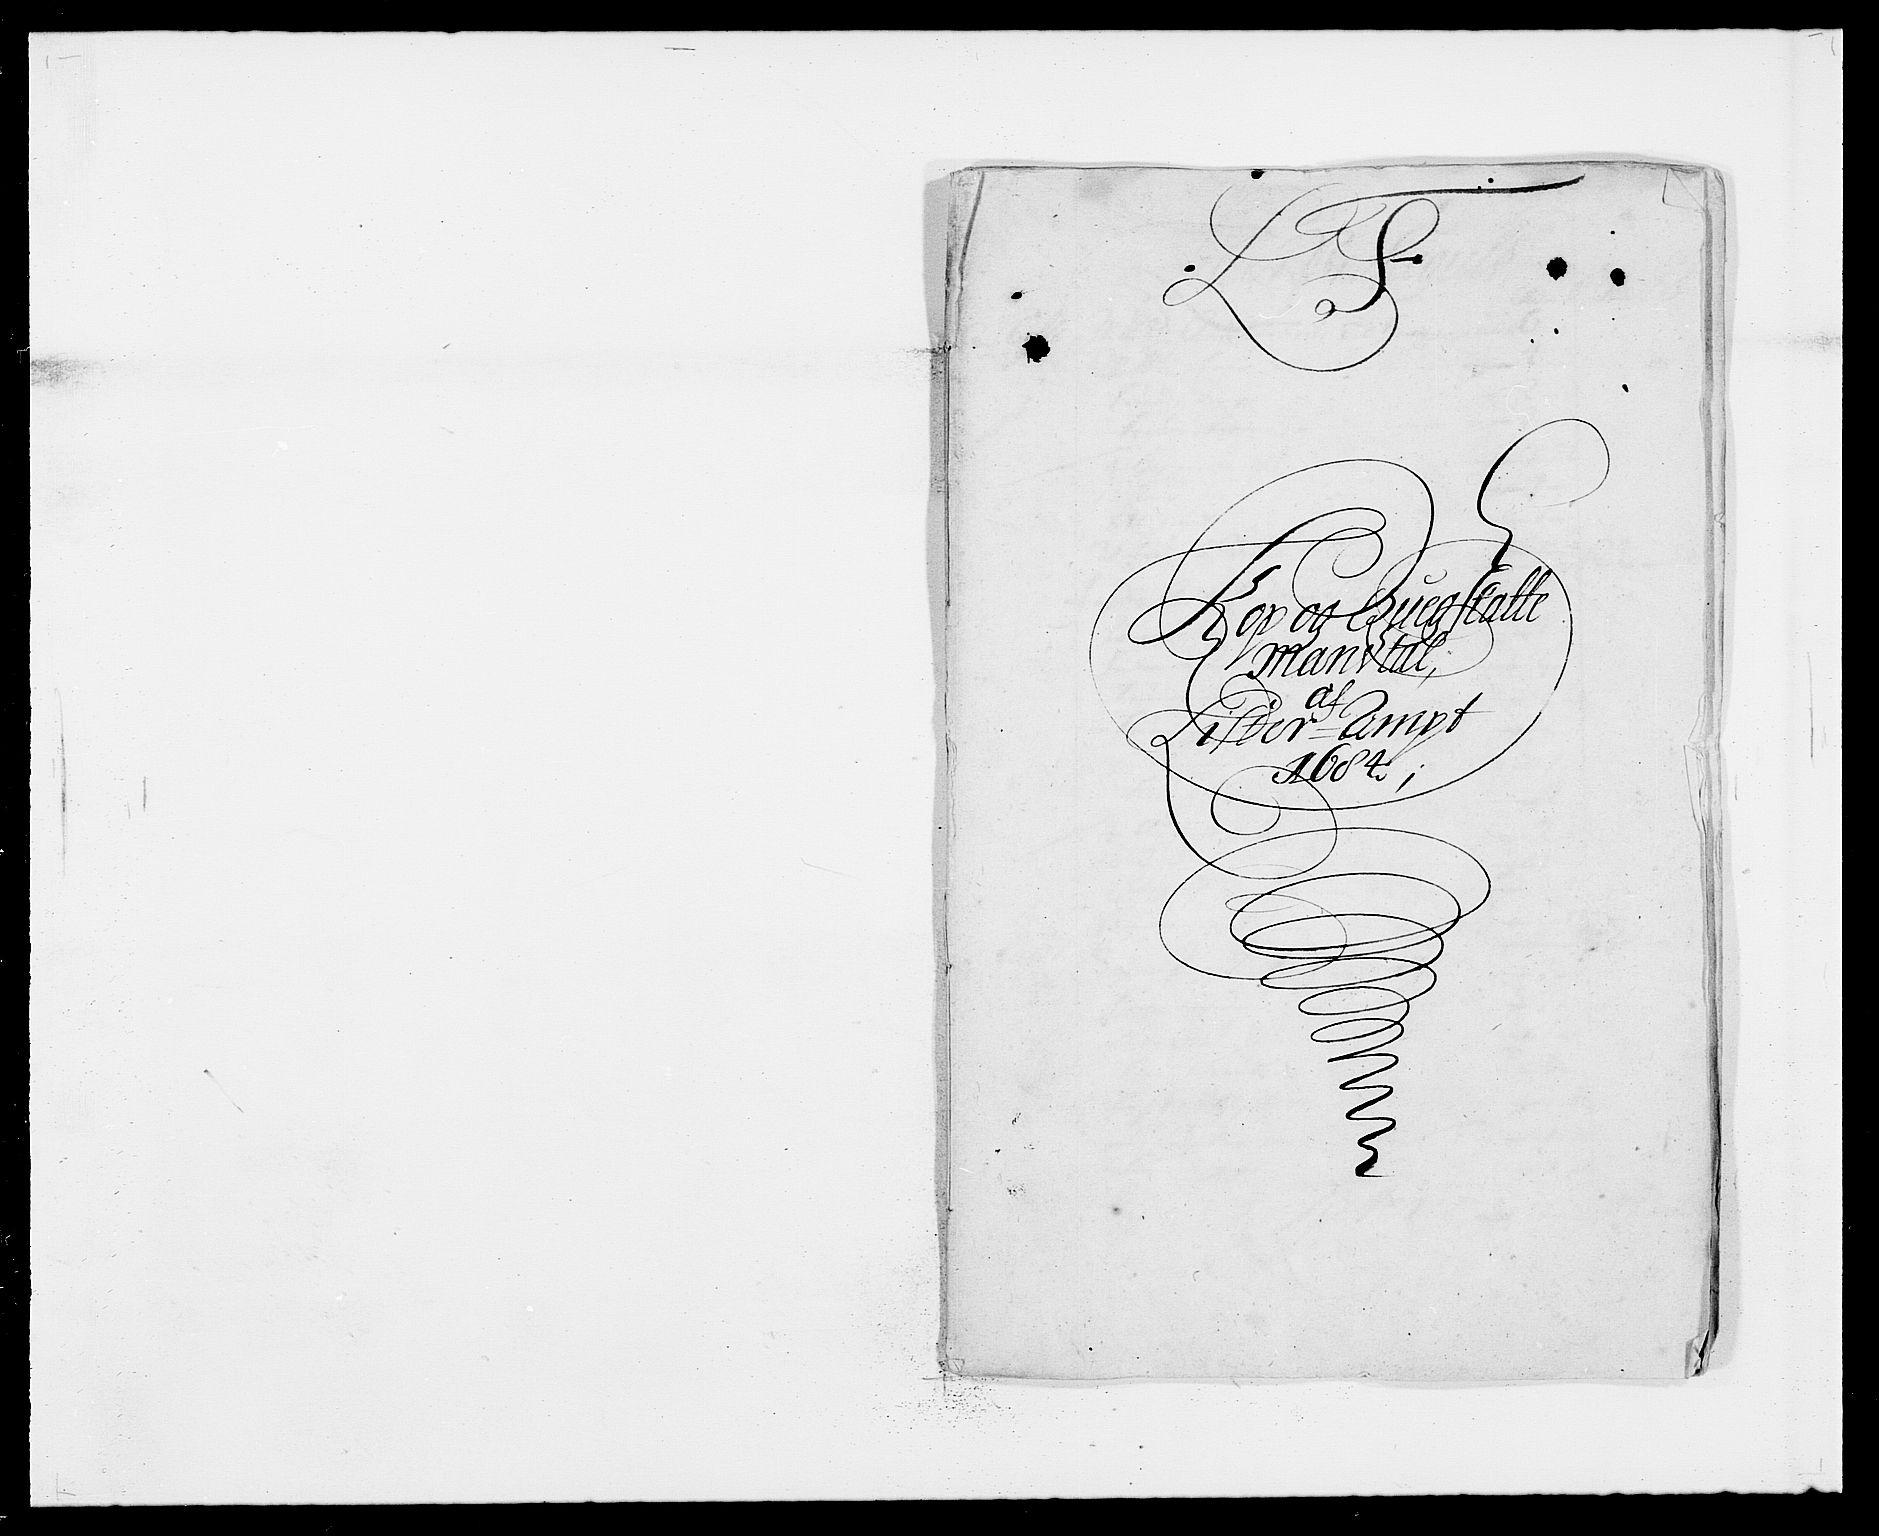 RA, Rentekammeret inntil 1814, Reviderte regnskaper, Fogderegnskap, R41/L2533: Fogderegnskap Lista, 1684-1685, s. 129